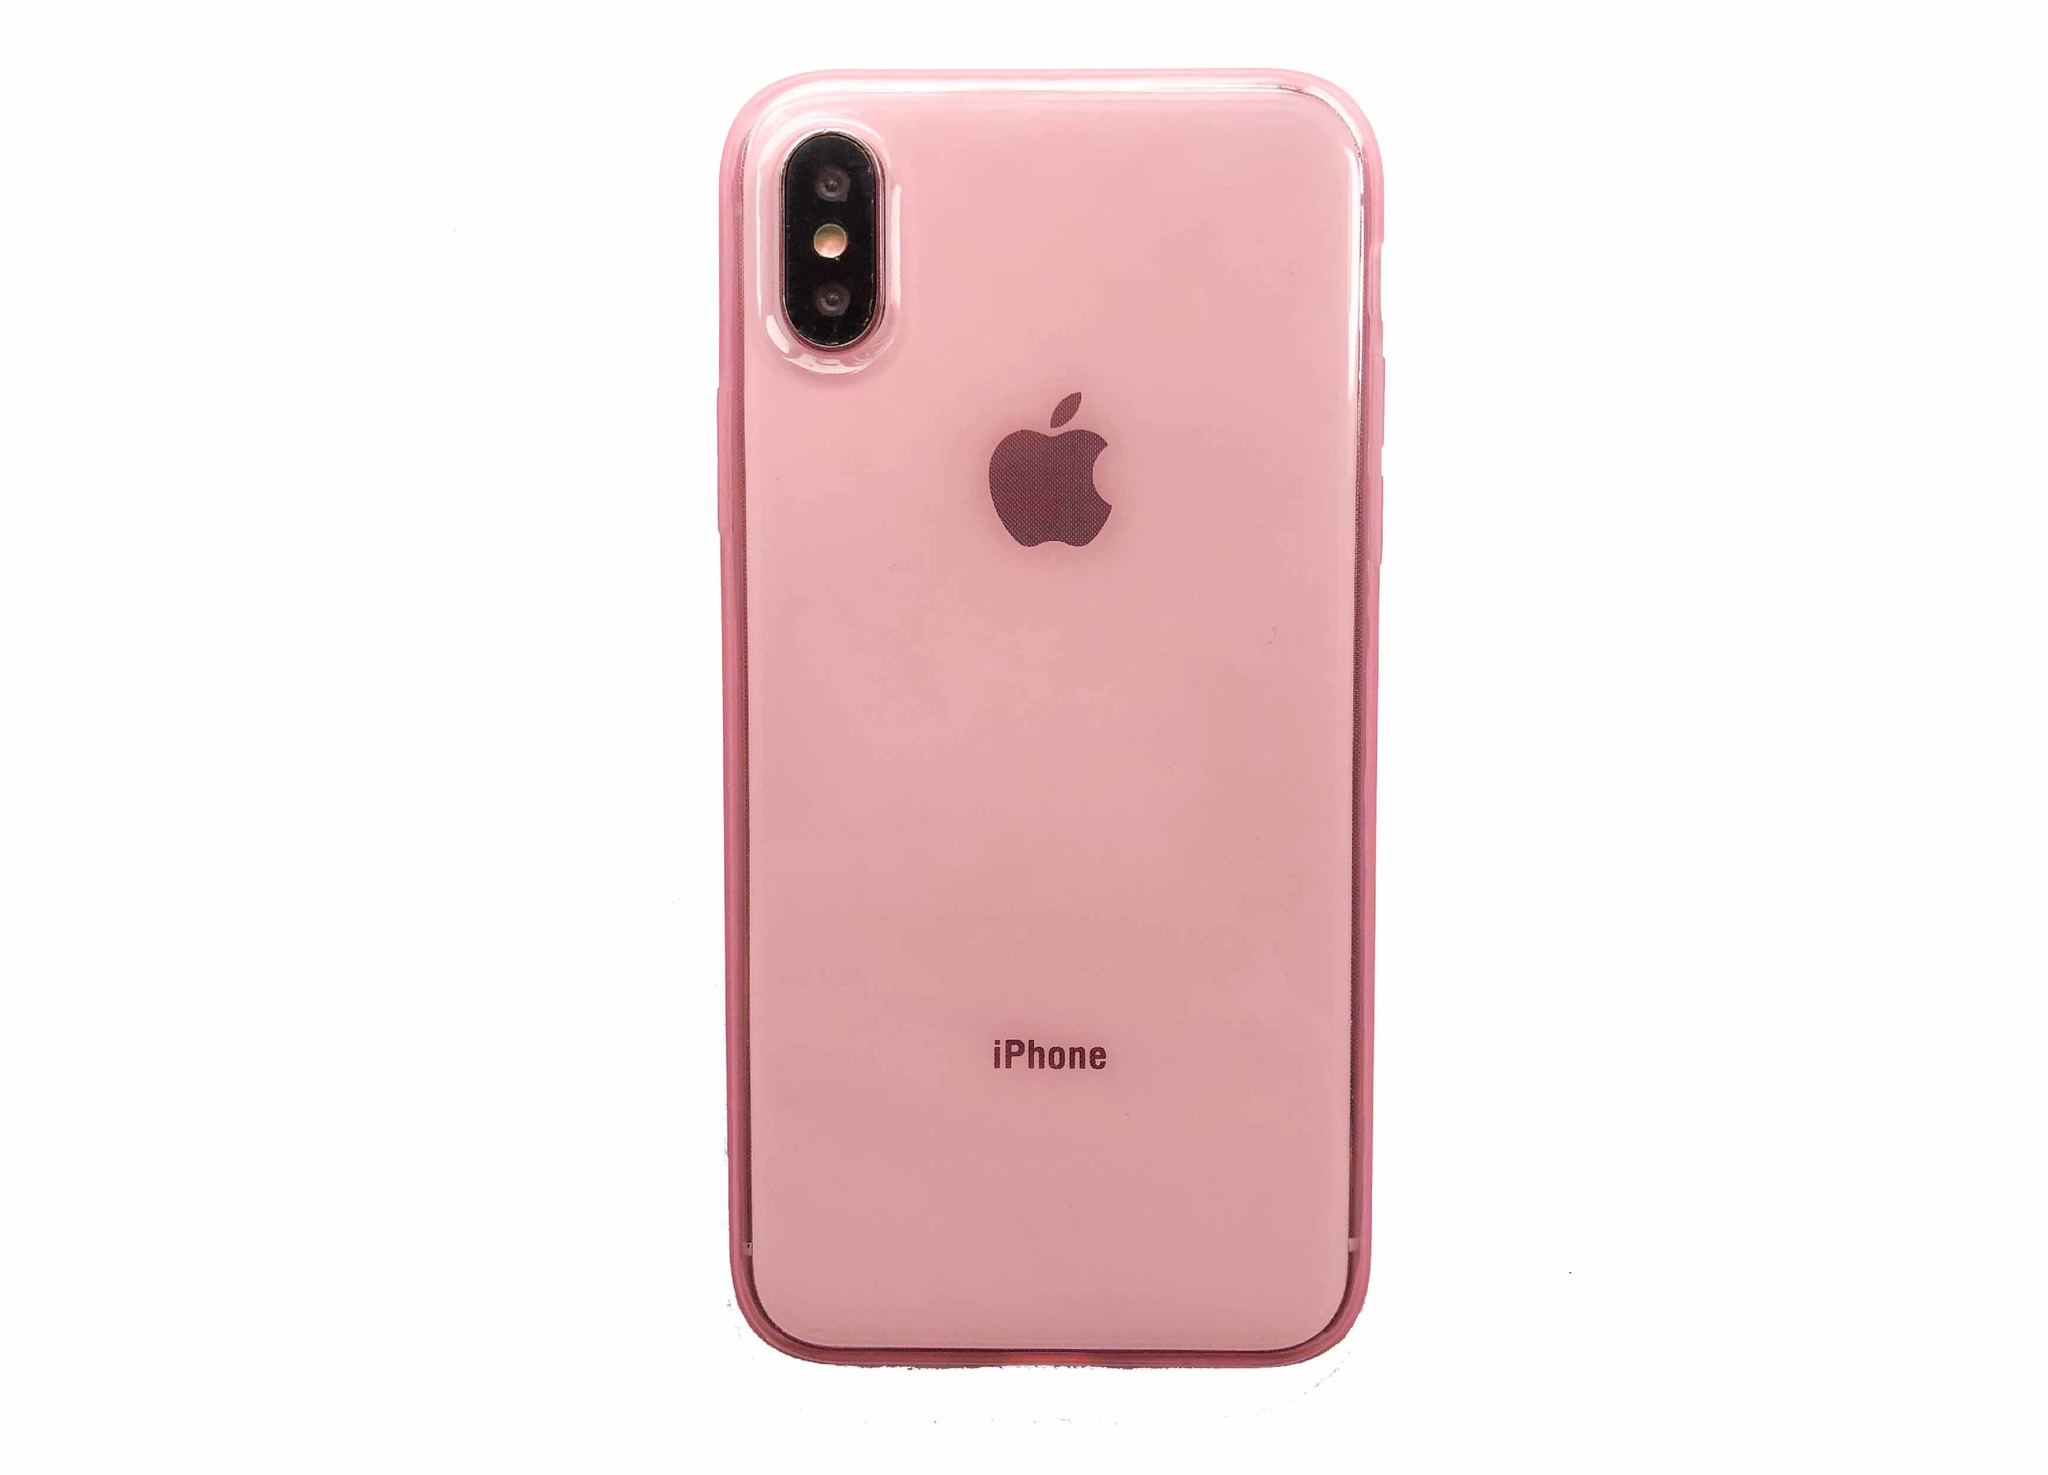 Smartphonehoesje iPhone X / XS | Roze / transparant